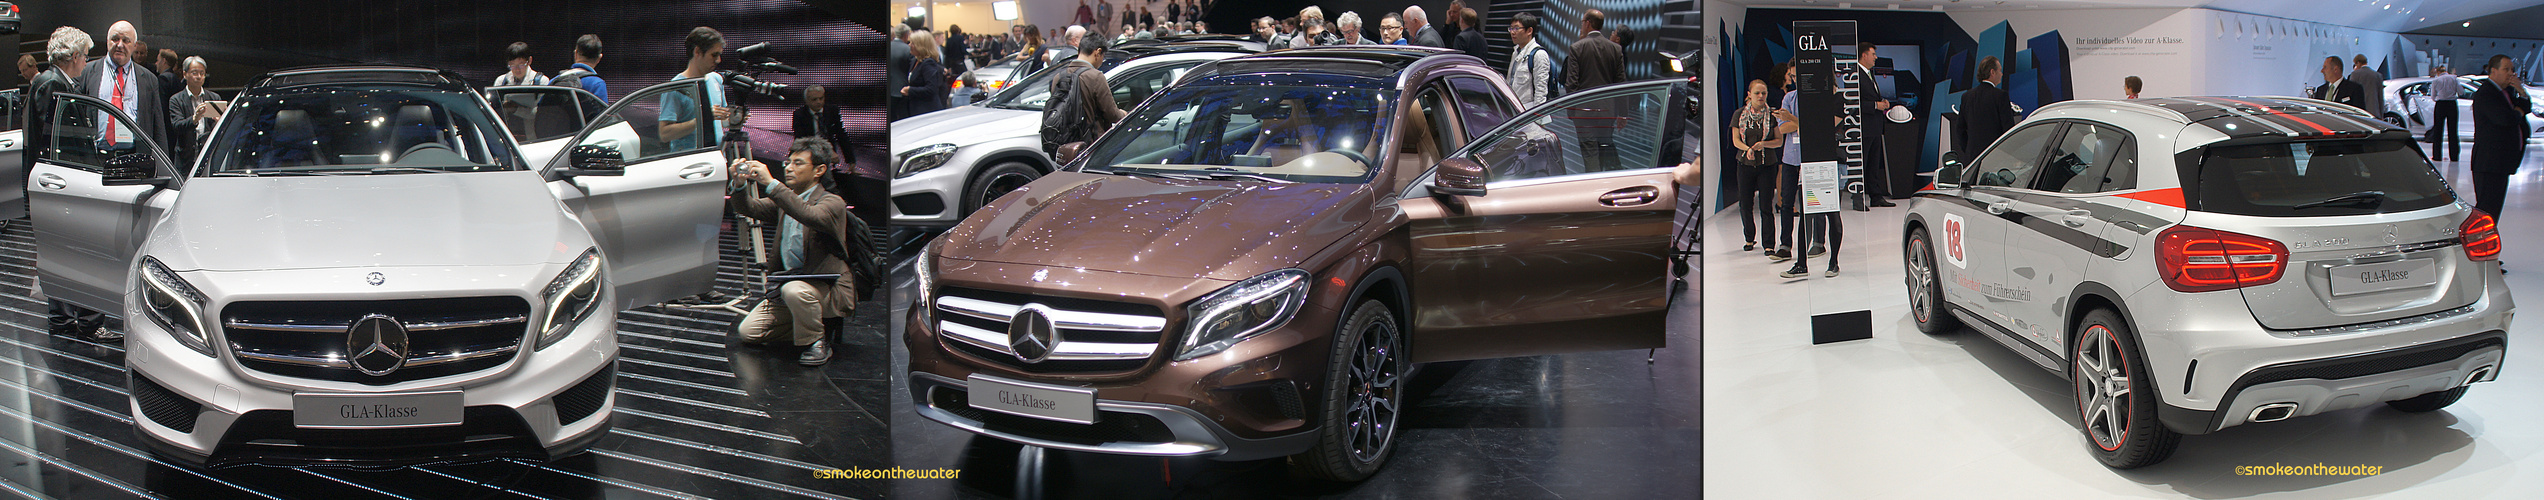 Weltpremiere: Mercedes GLA-Klasse